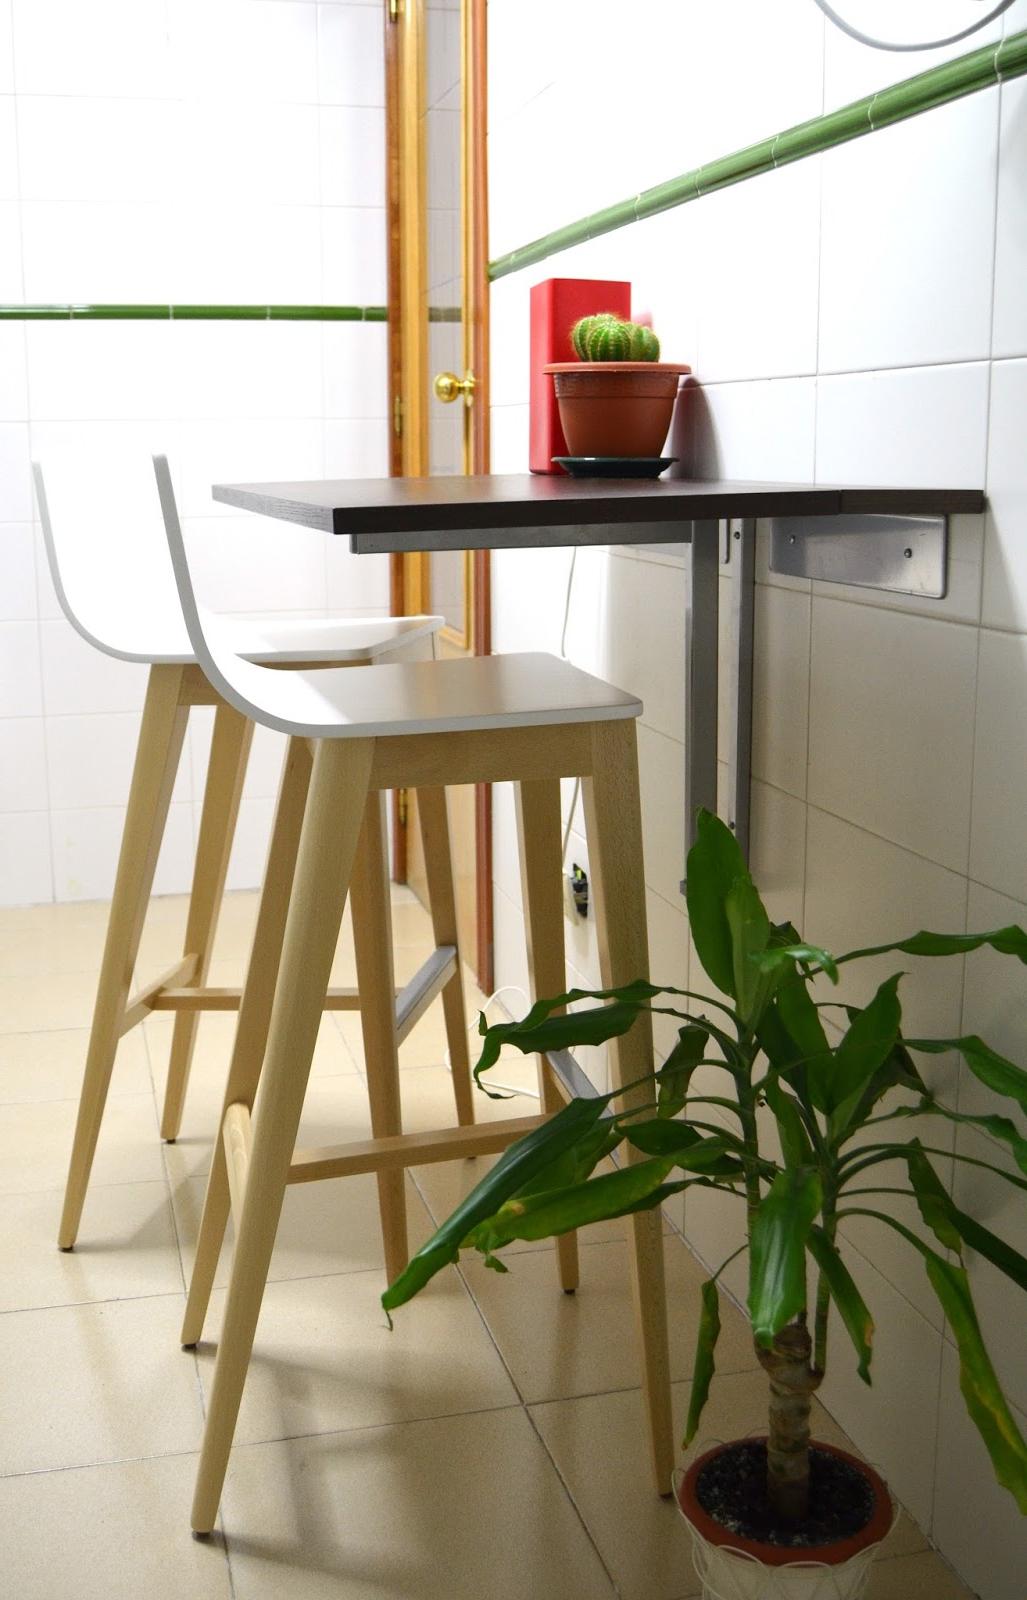 Mesa Cocina Estrecha Y7du Art Maà as Opcià N De Barra Plegable Si Tu Cocina Es Estrecha Para